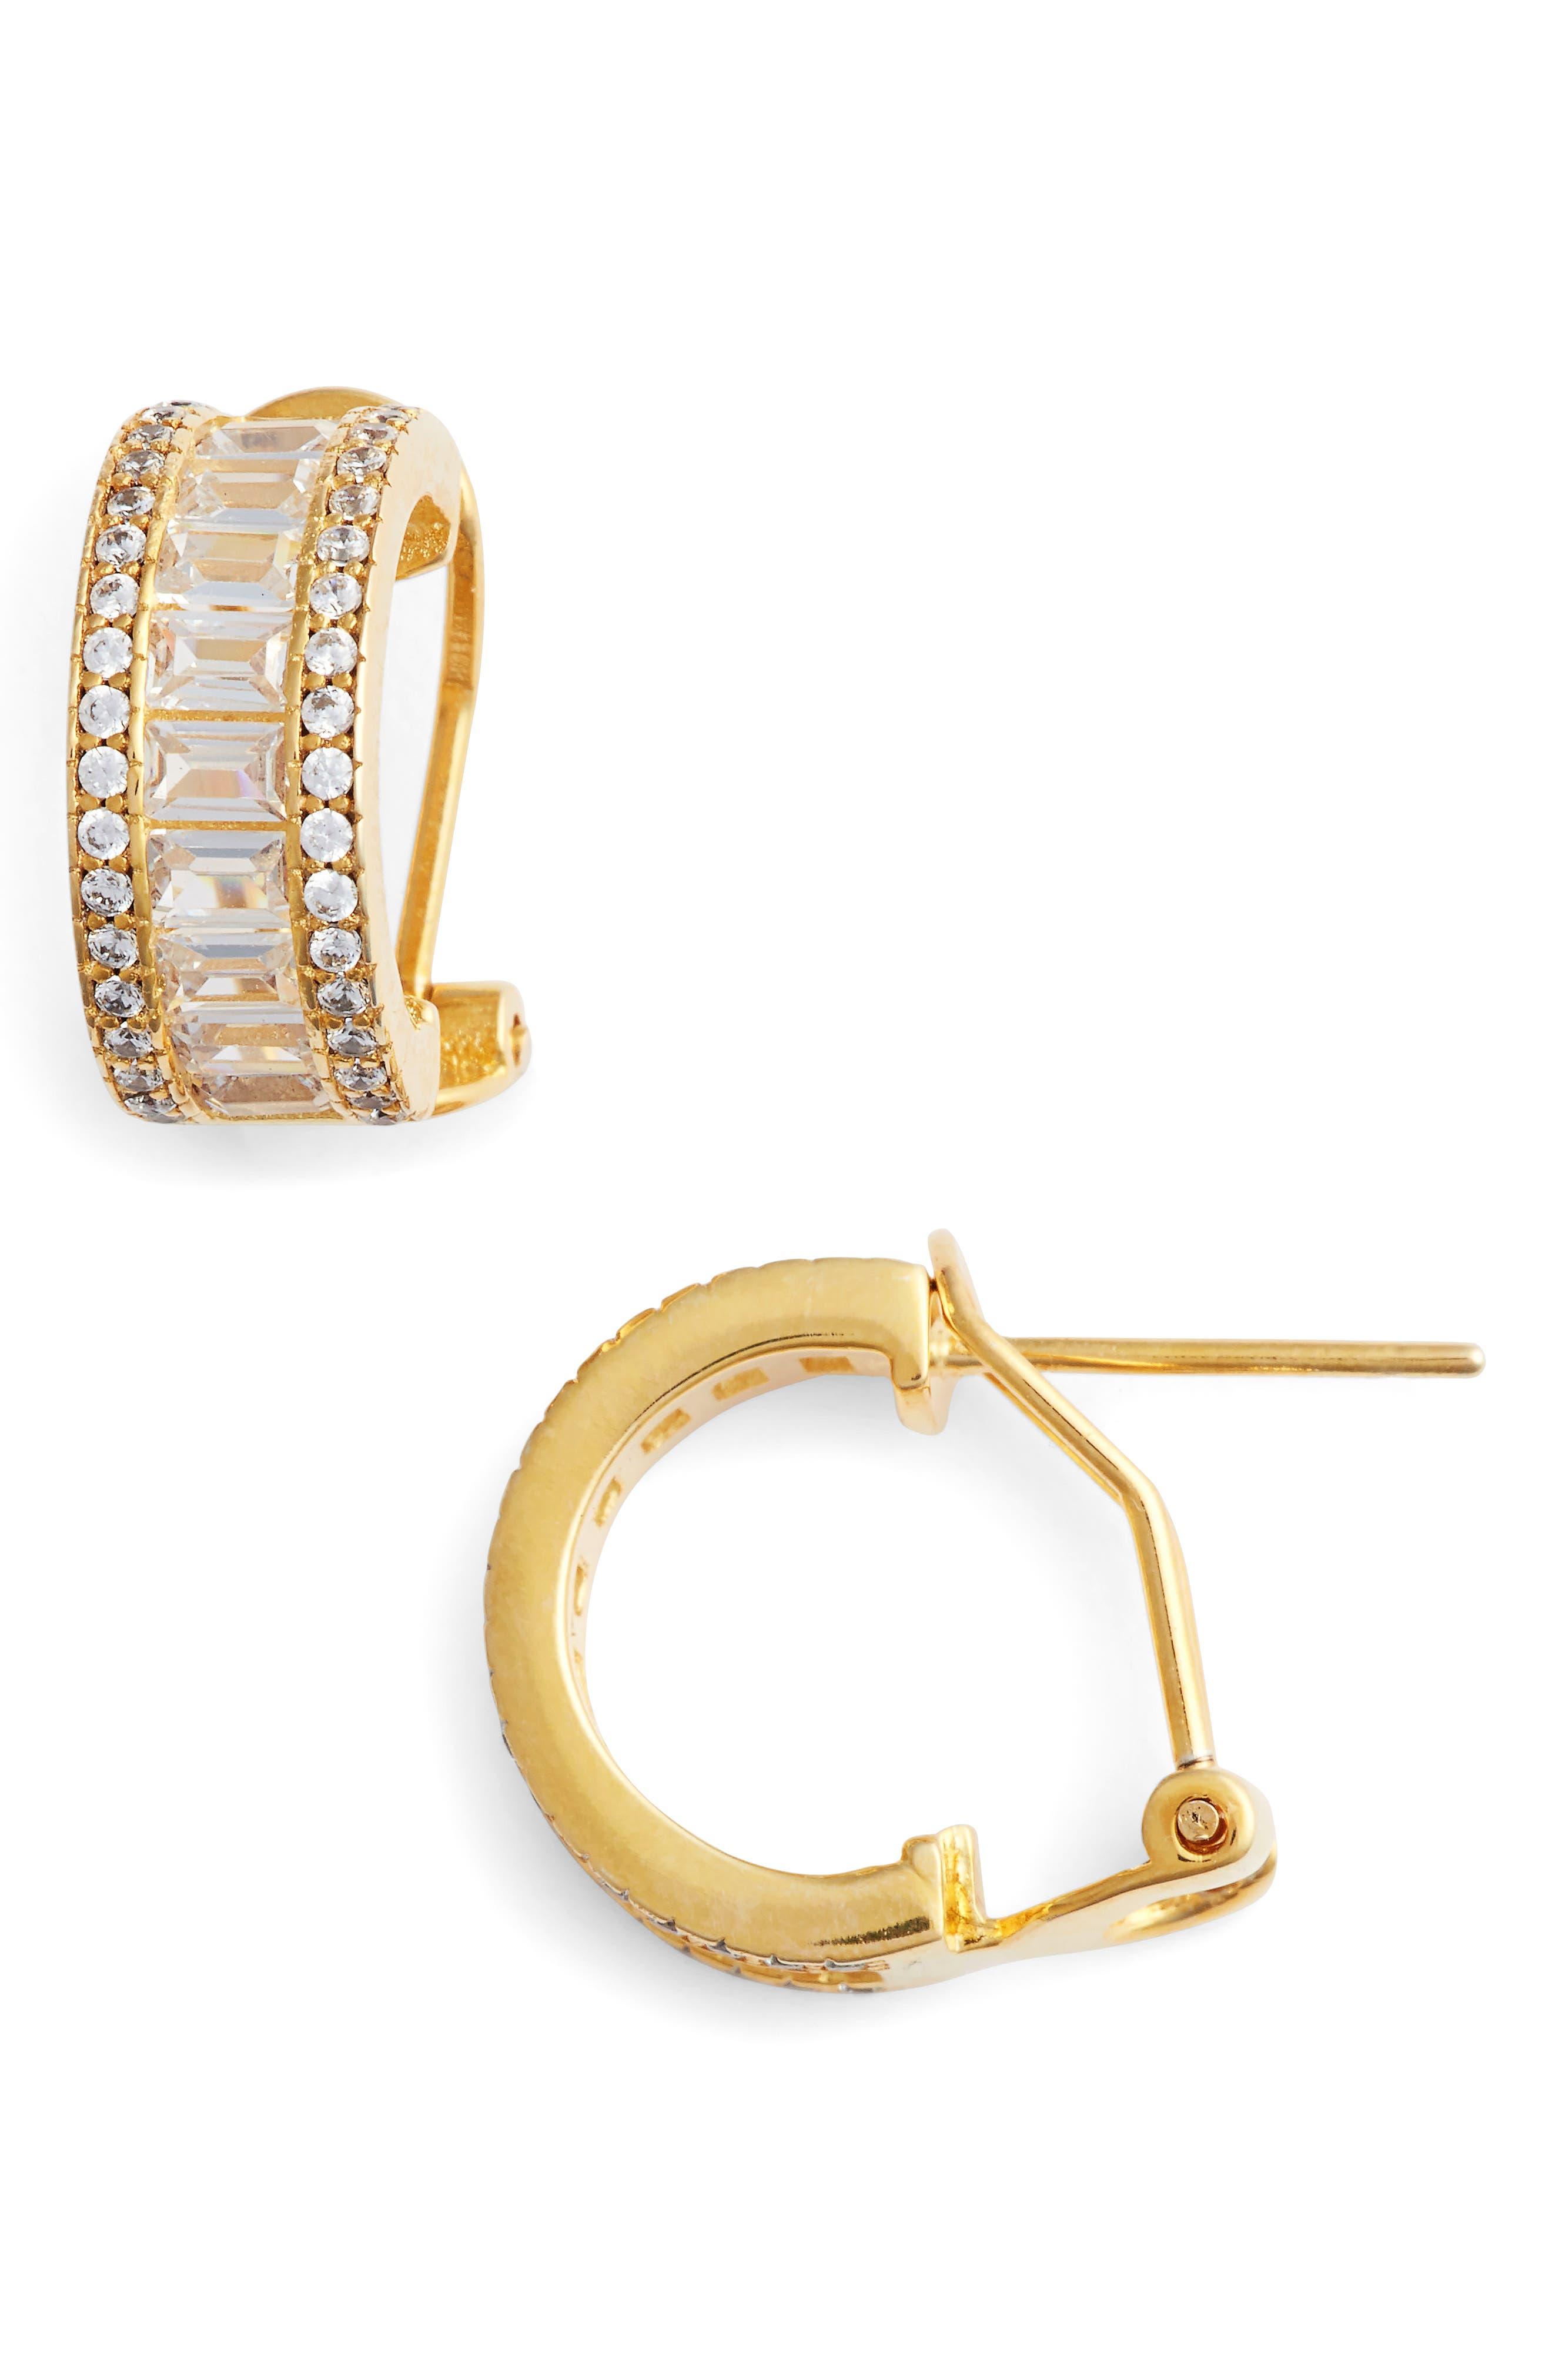 Small Baguette Pavé Hoop Earrings,                             Main thumbnail 1, color,                             Gold/ White Cz